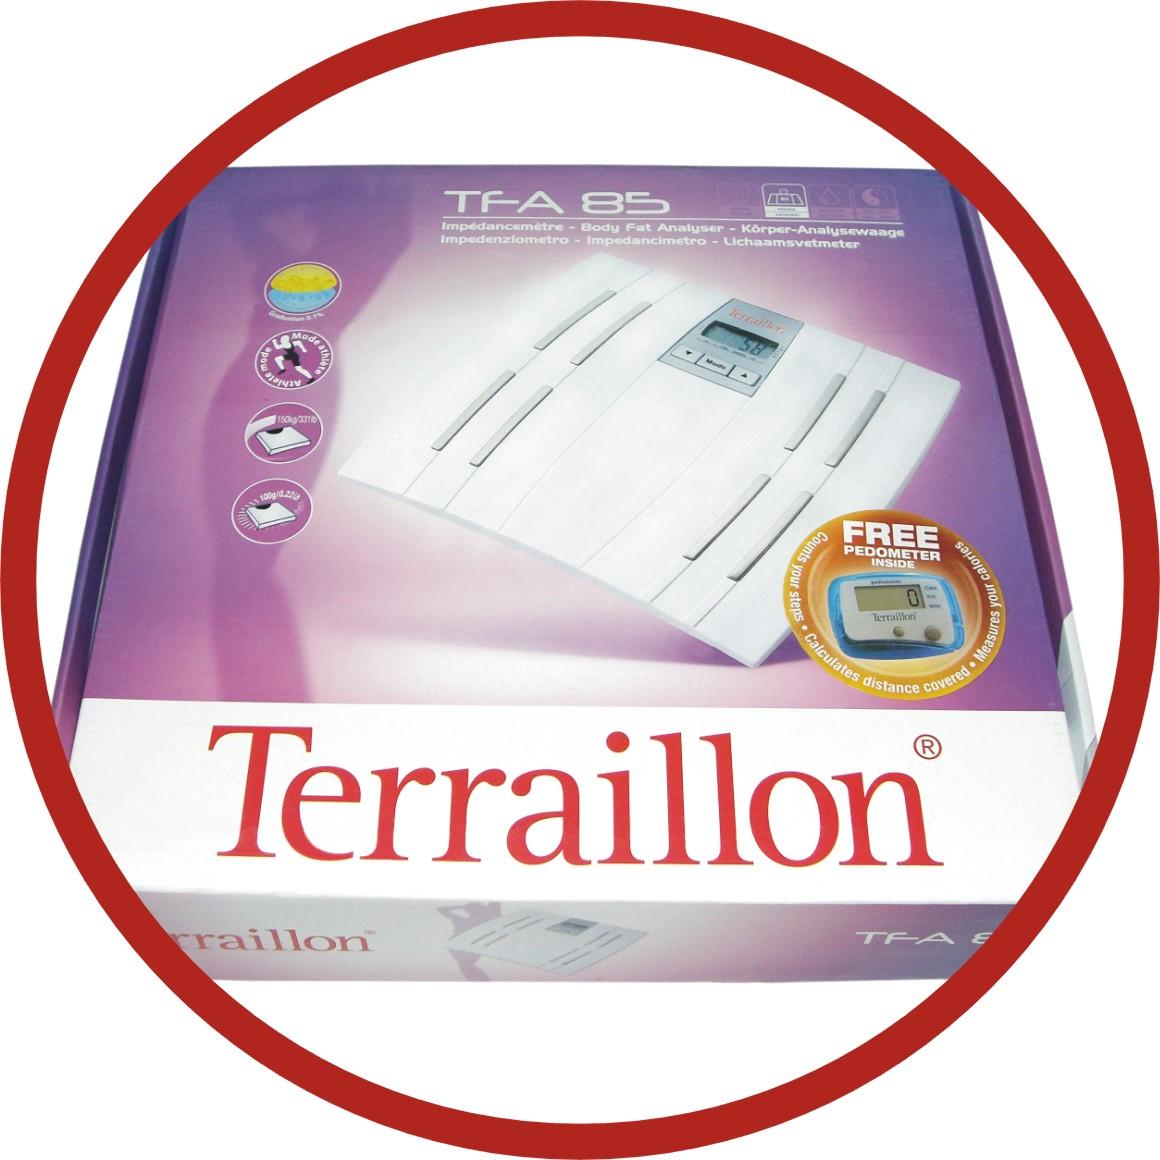 Bathroom scale body fat - Product Descriptionlast Updated 2 17 2017 3 56 07 Pm Terraillon Tfa 85 Electronic Bathroom Scale Body Fat Analyzer